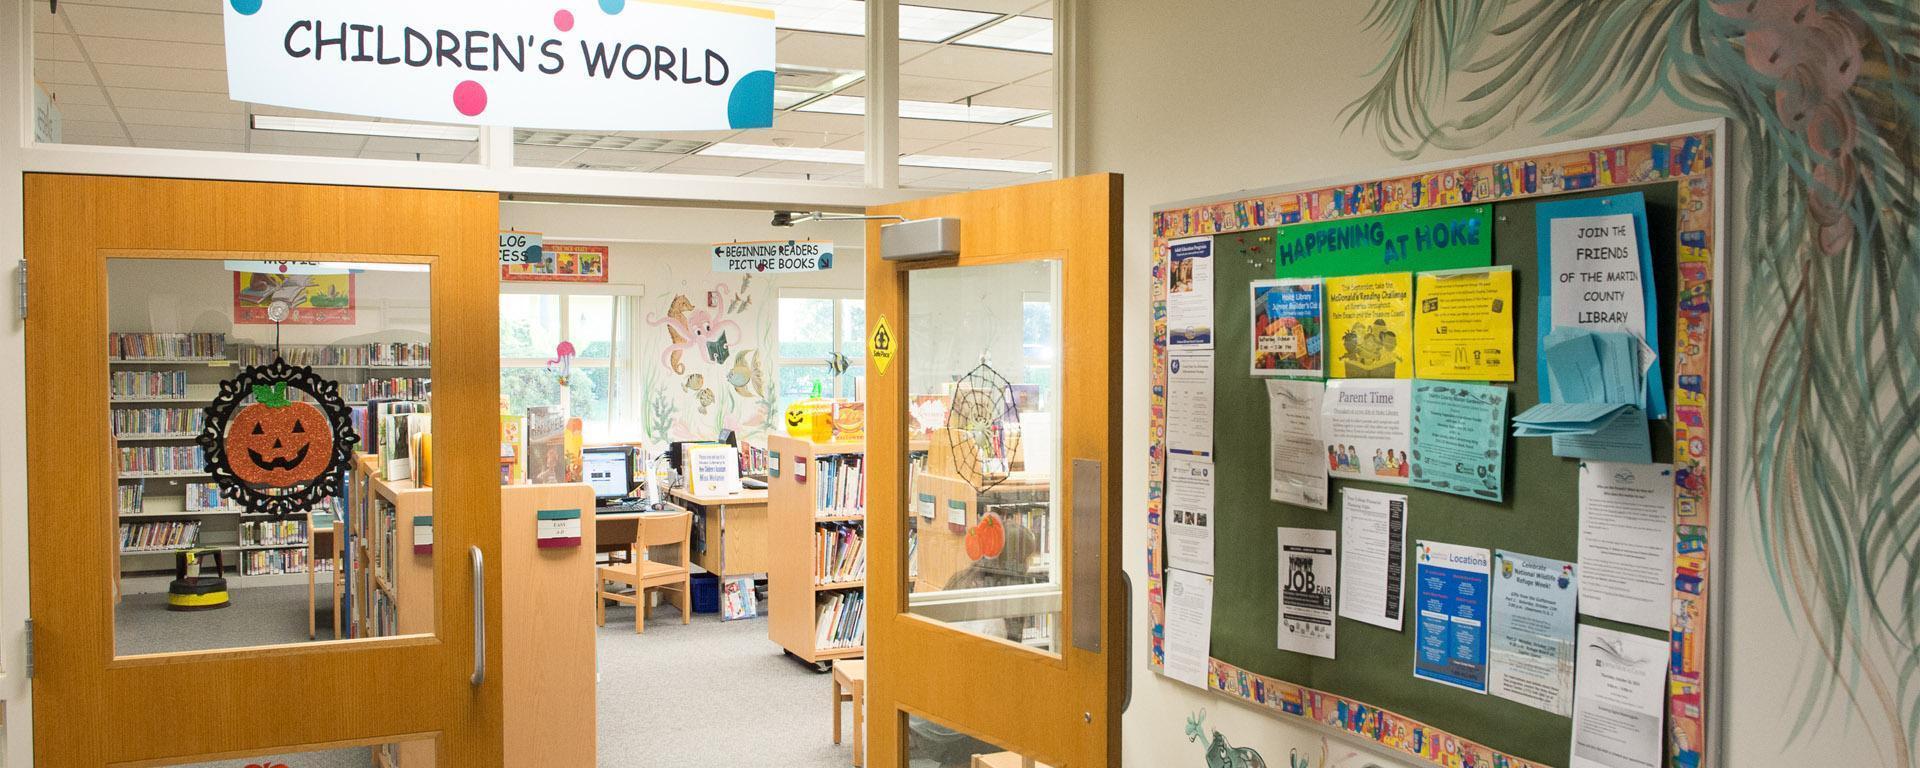 Photo of the doors to the children's room